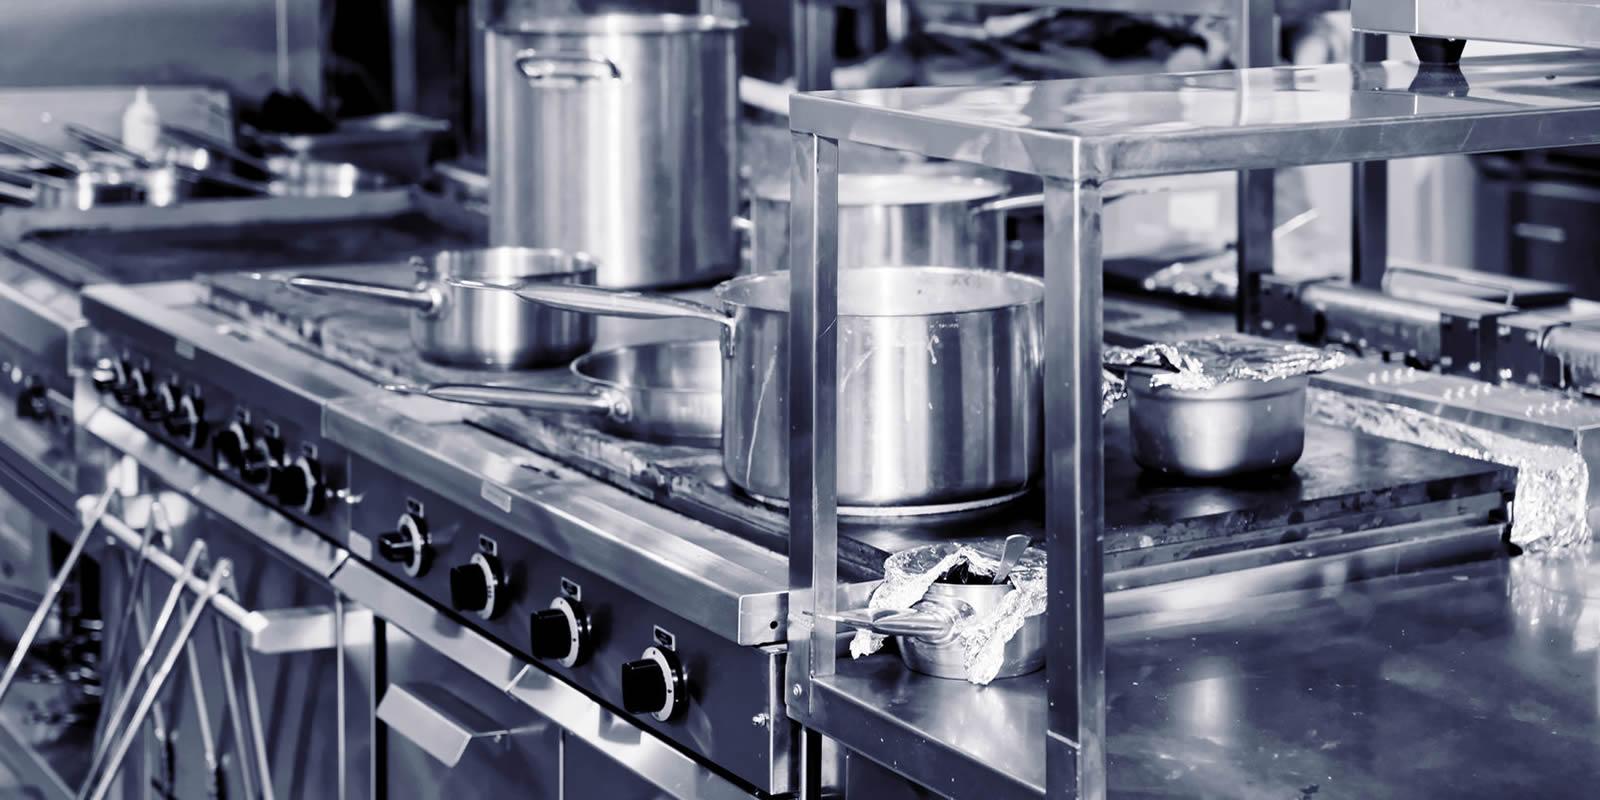 settore ristorazione torneria argi minuterie metalliche